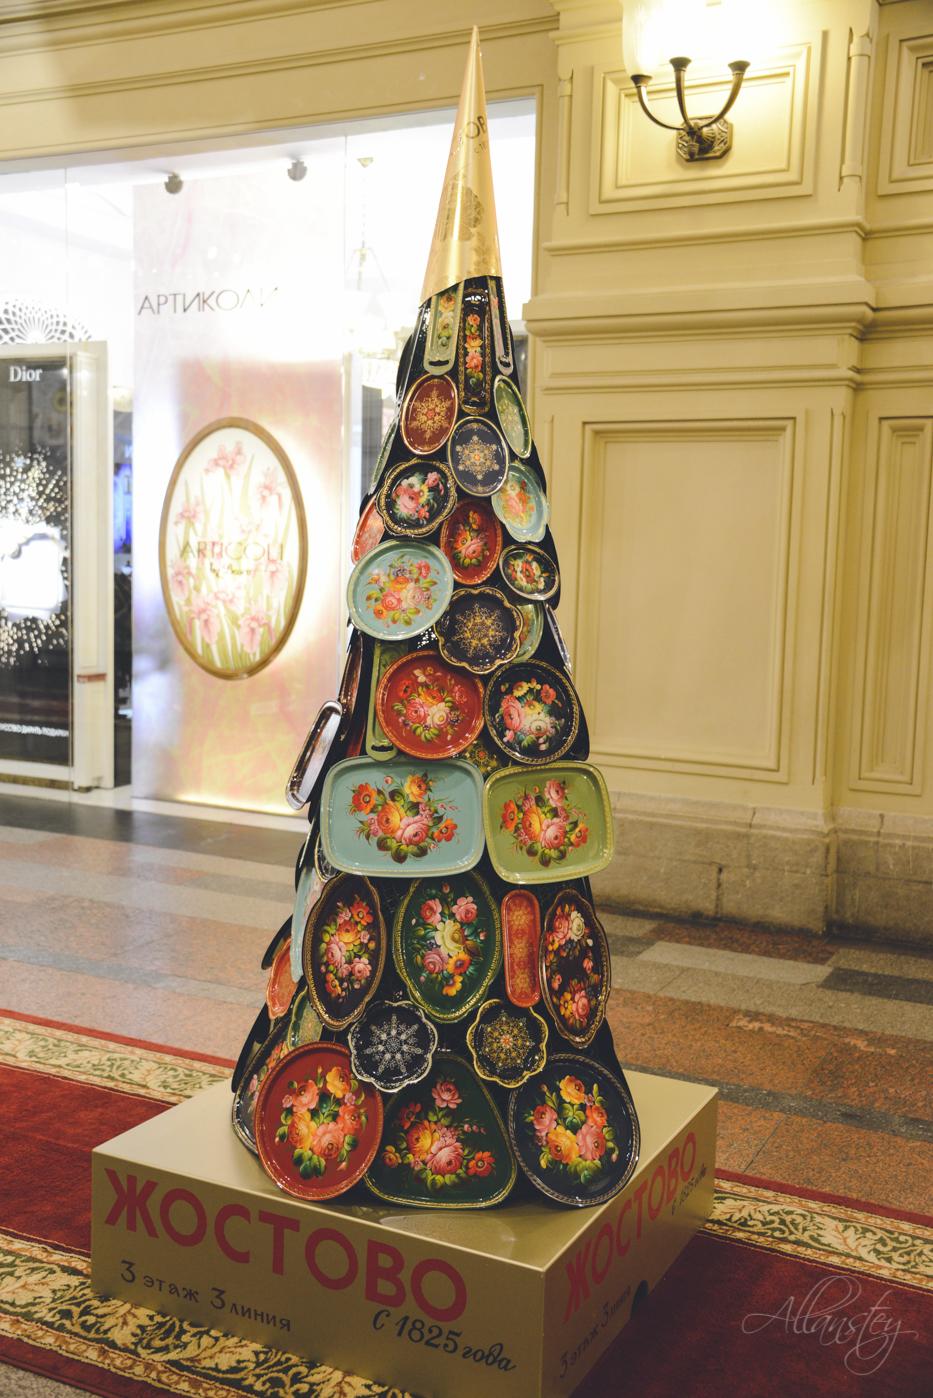 Christmas tree made of metal trays with Zhostovo painting